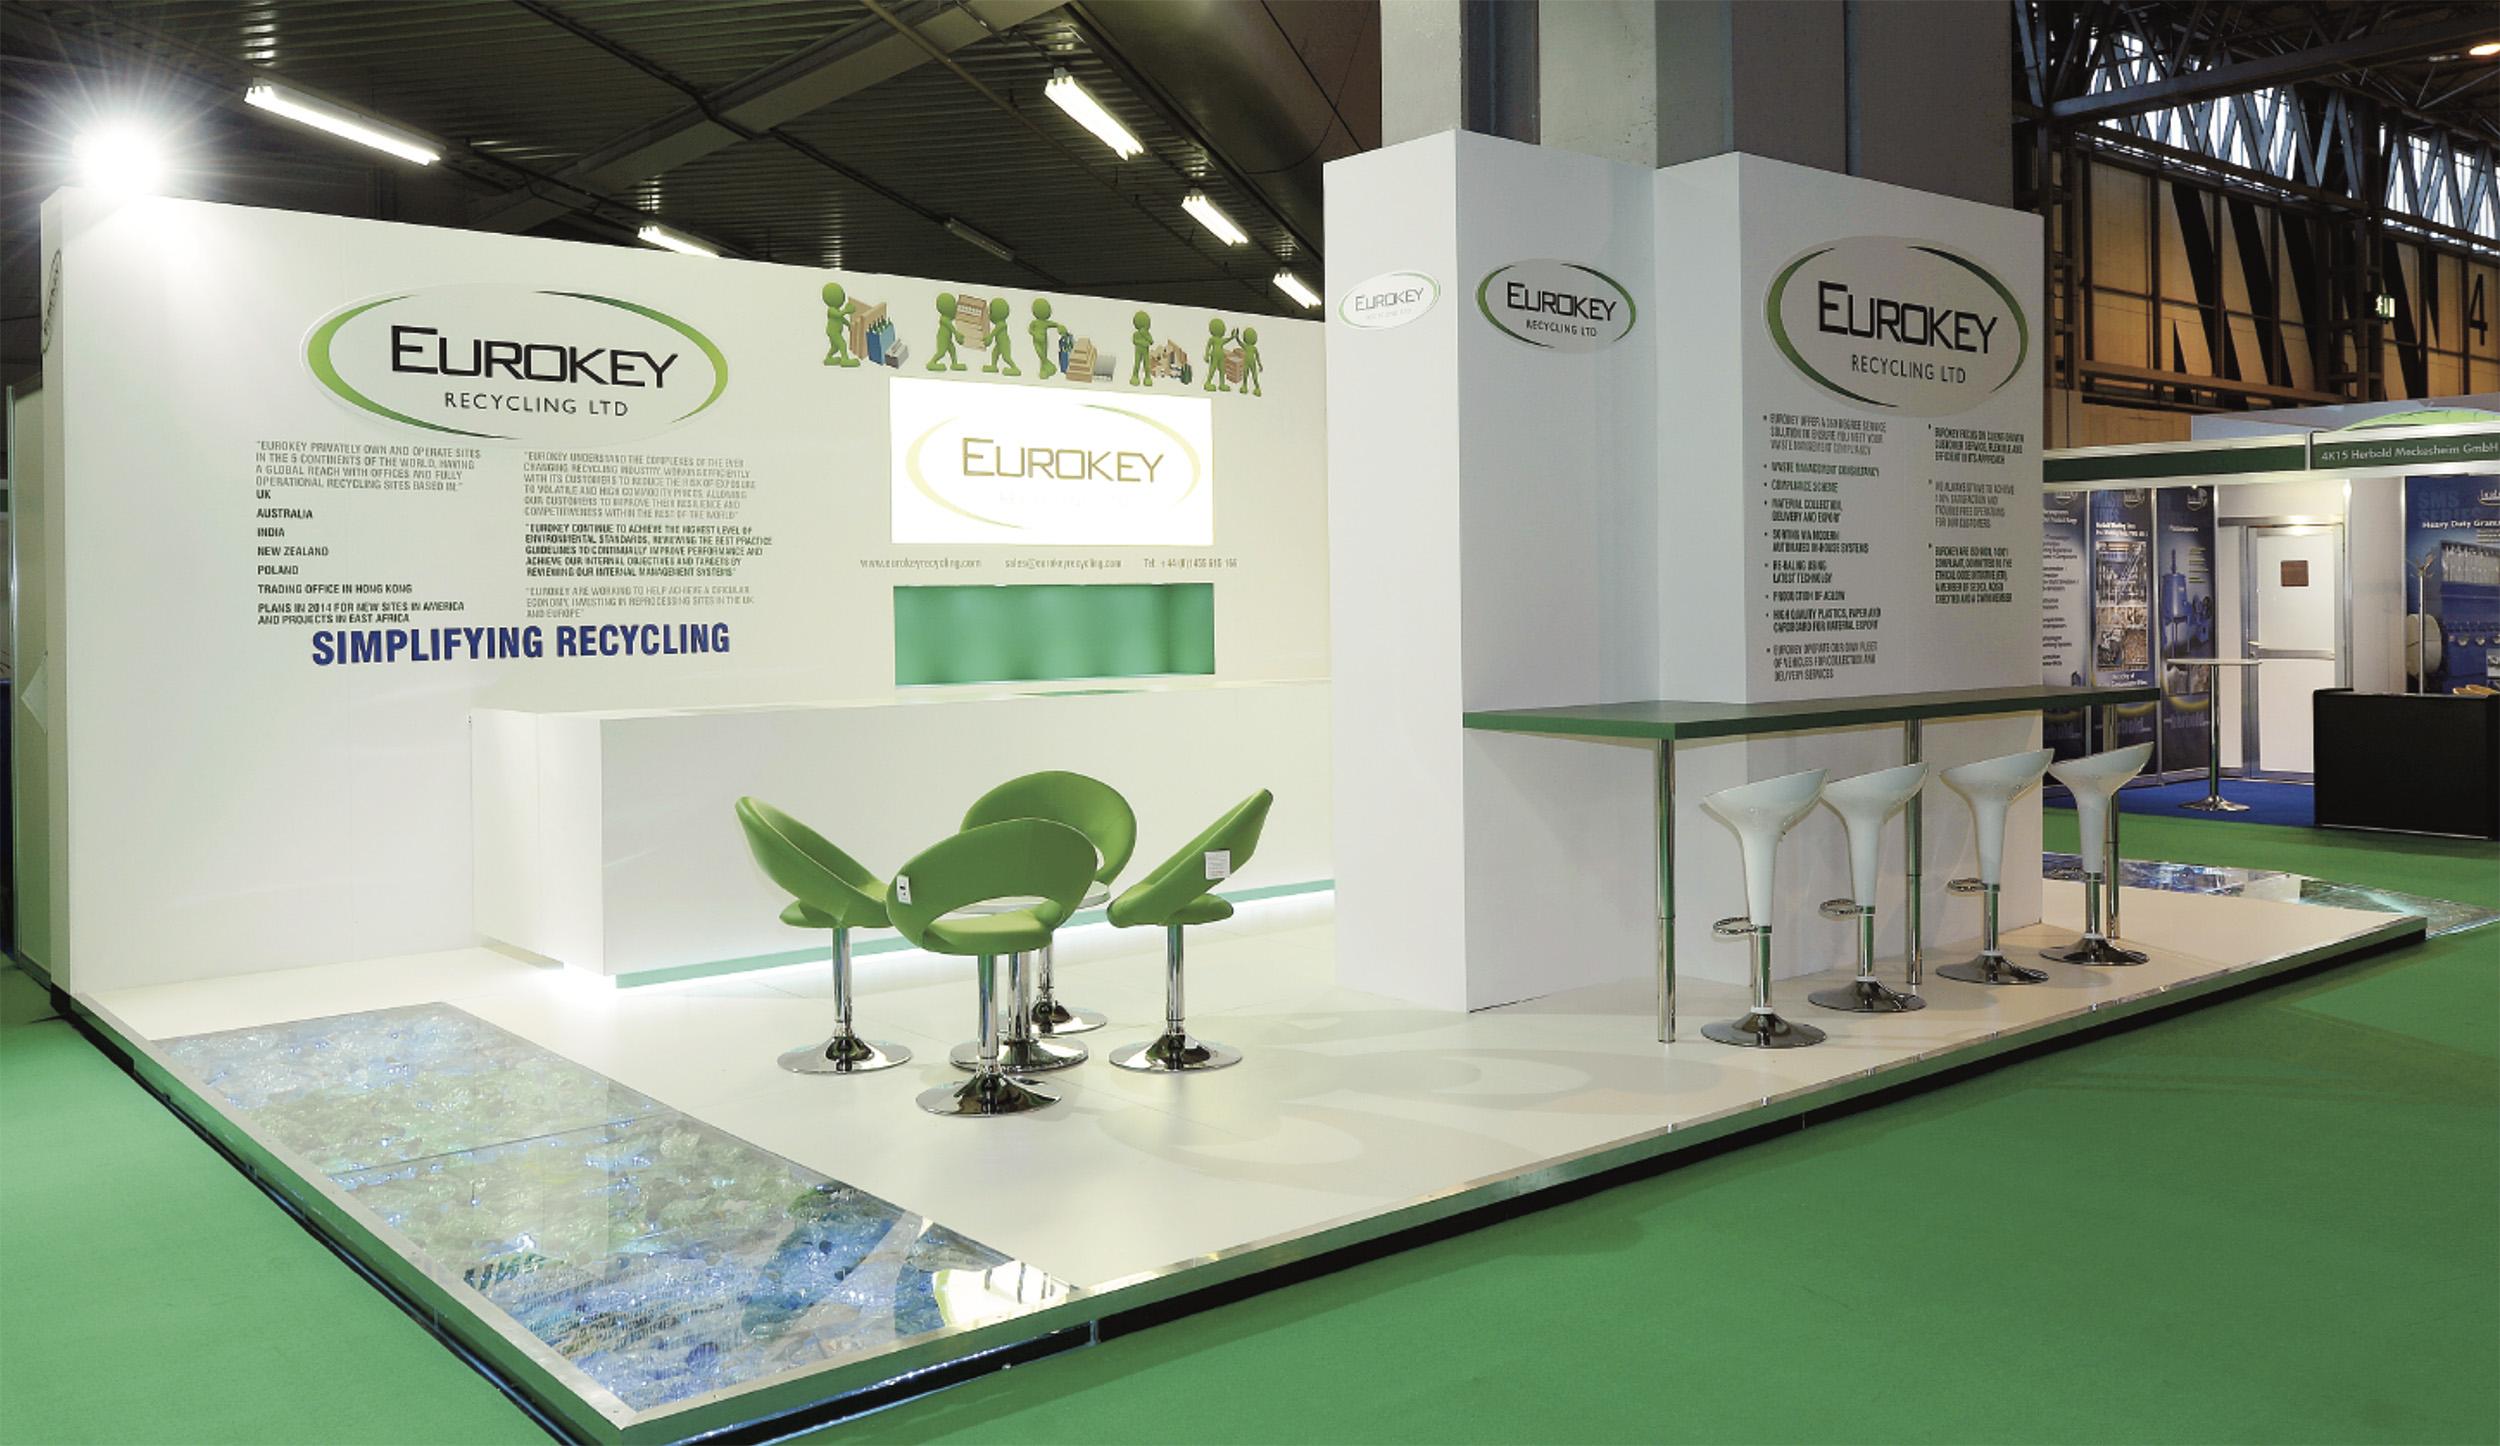 Eurokey exhibition stand